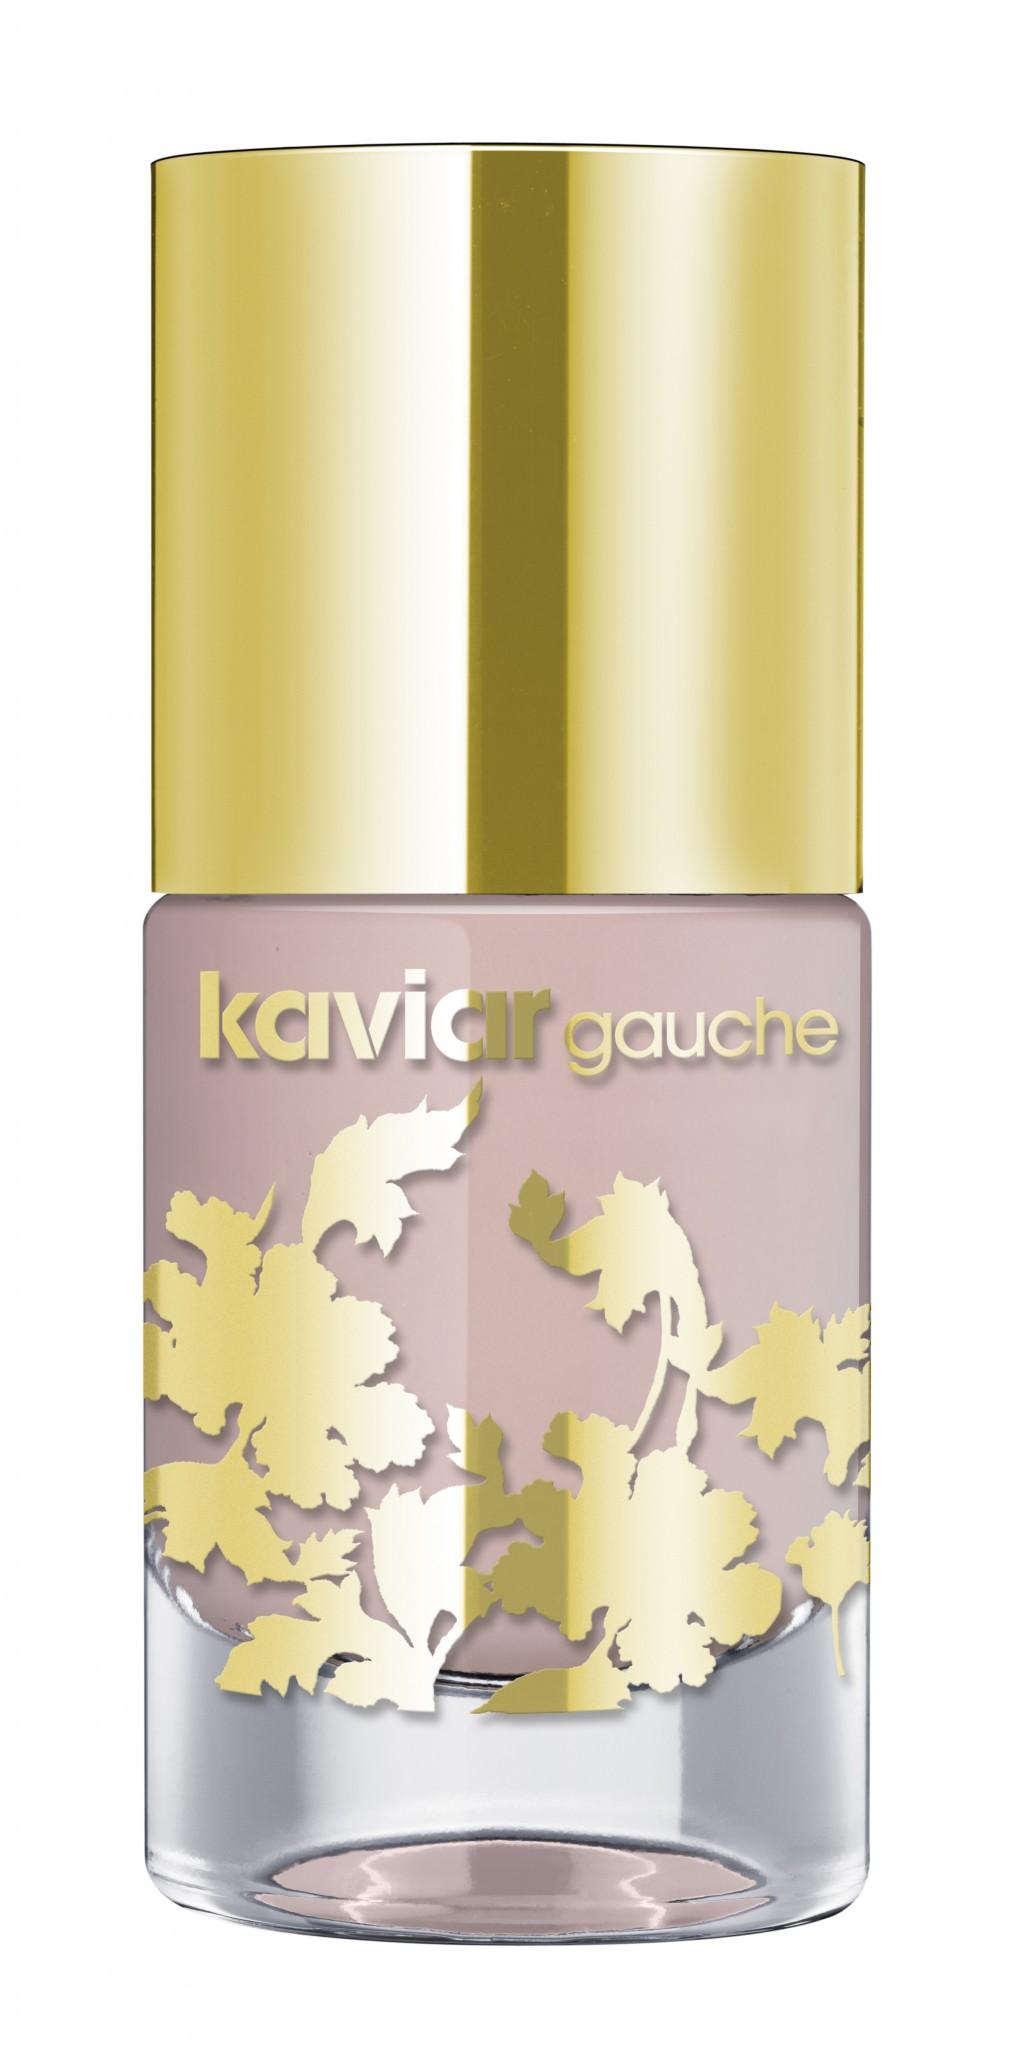 catr_kaviargauche_naillaquers02